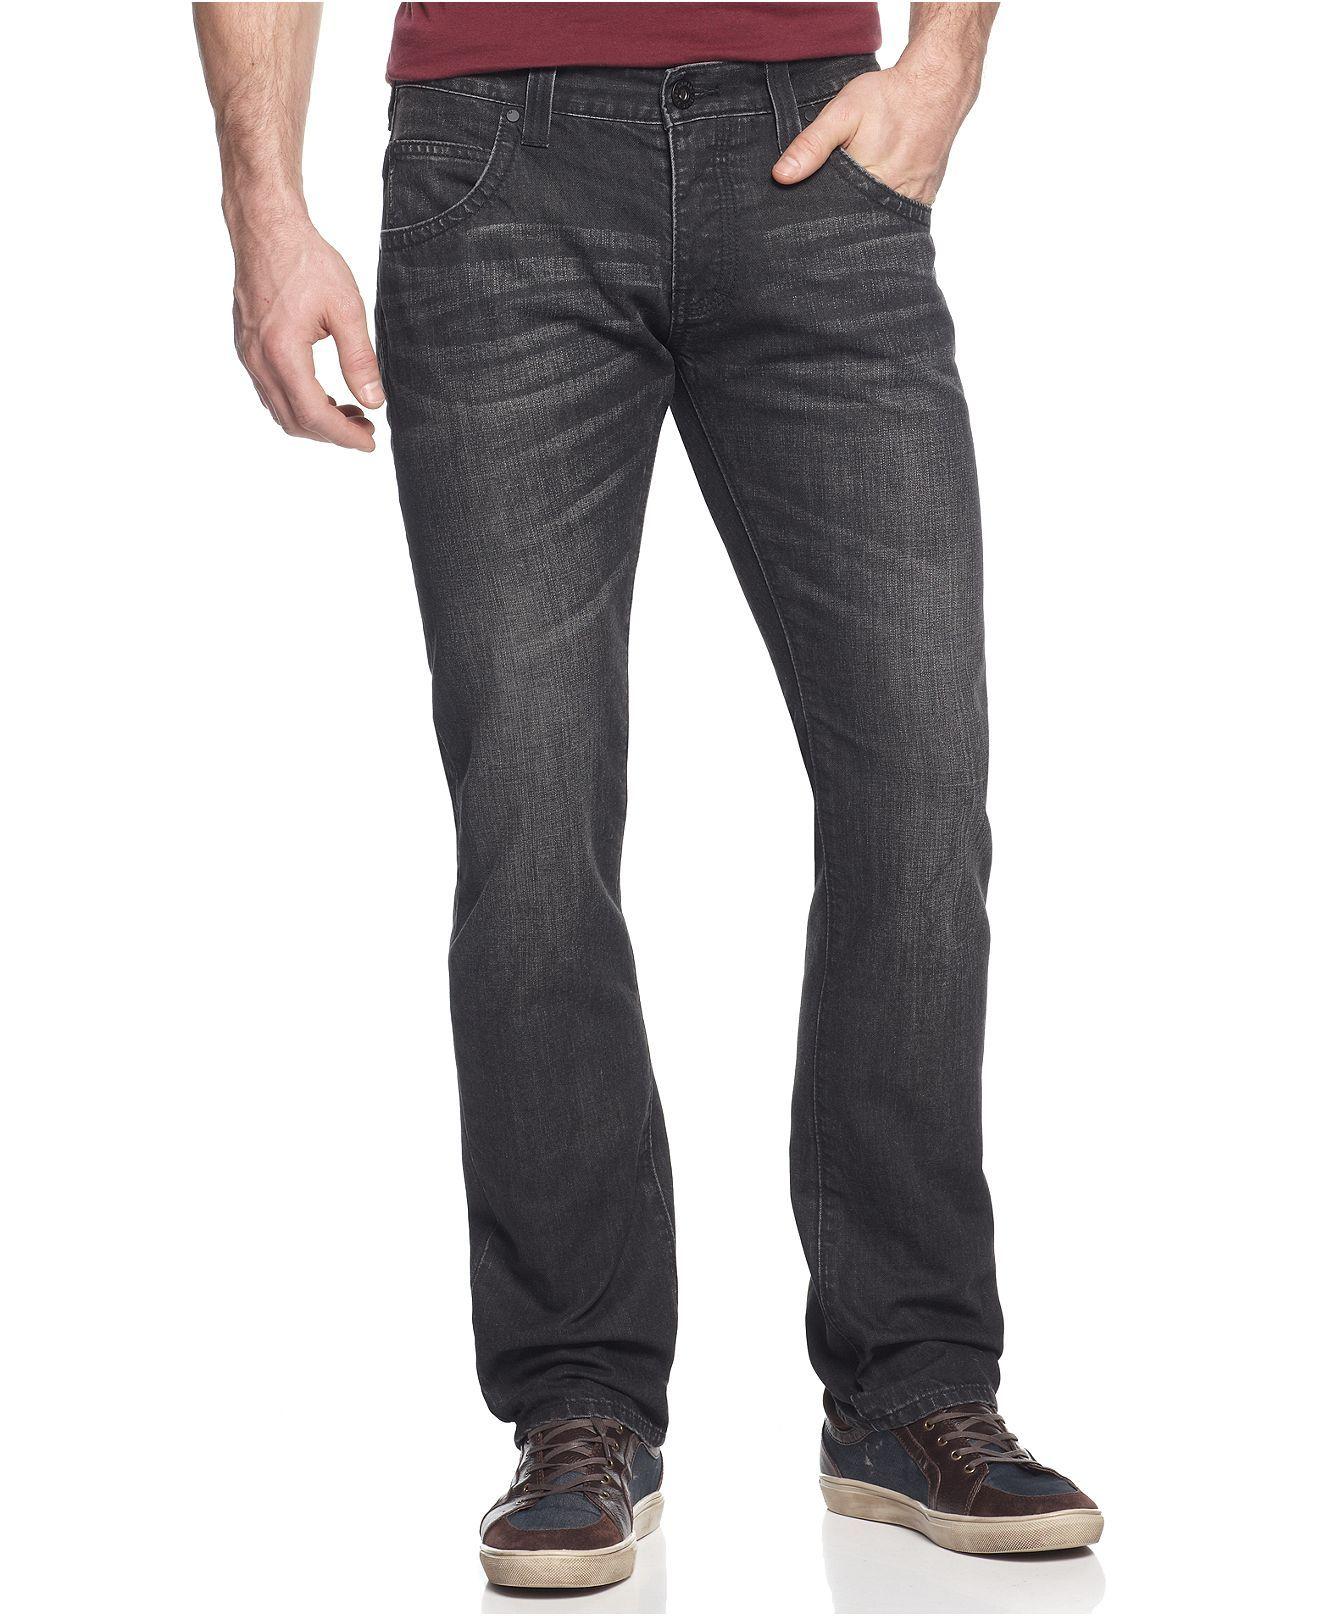 Armani jeans denim slim fit black wash jeans jeans